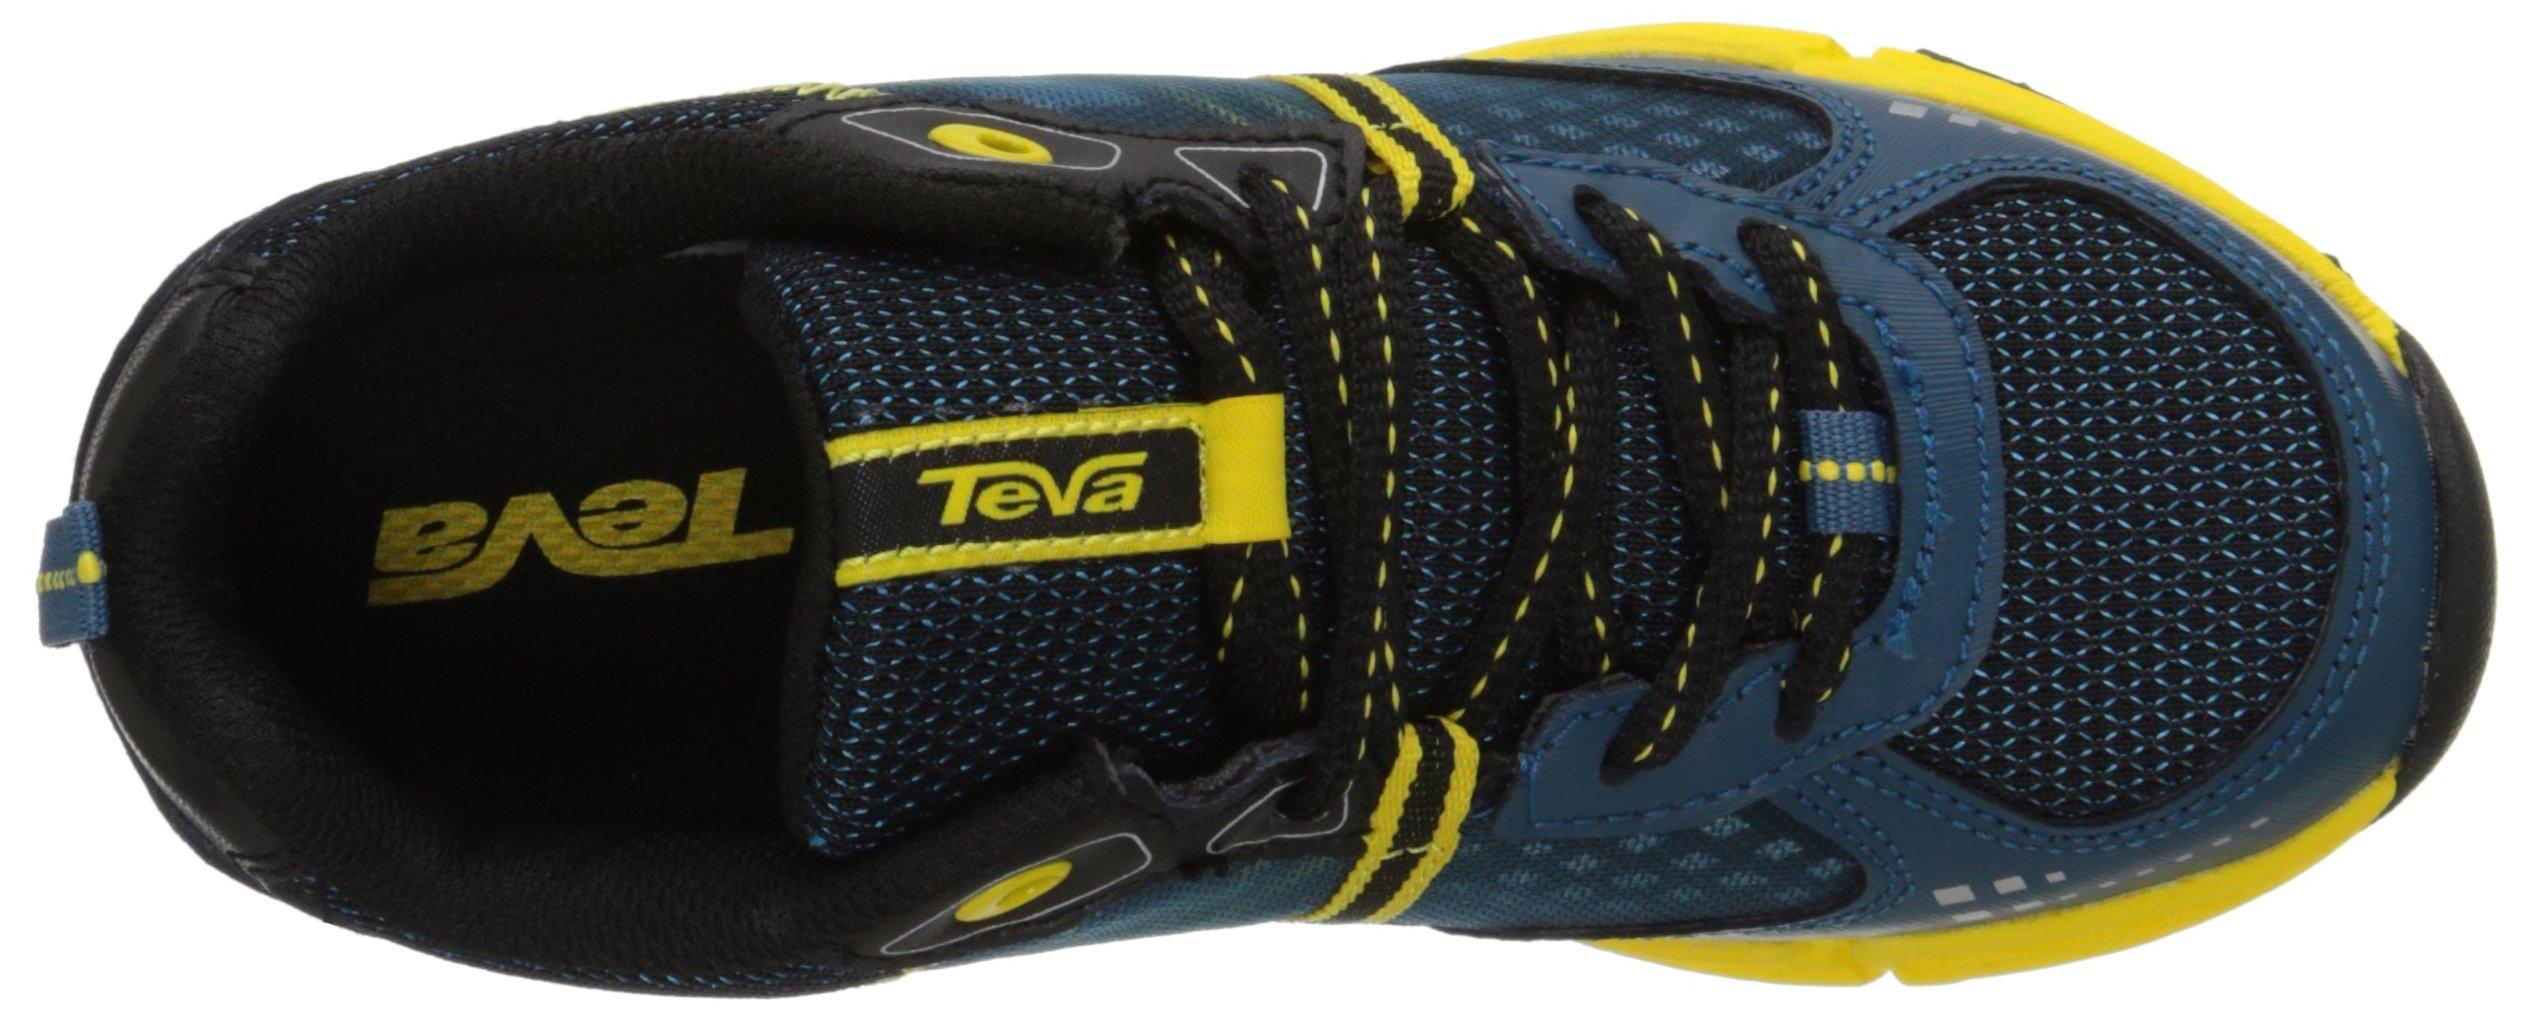 Teva Escapade Lo Athletic Trail Shoe (Little Kid/Big Kid), Blue/Yellow, 11 M US Little Kid by Teva (Image #8)